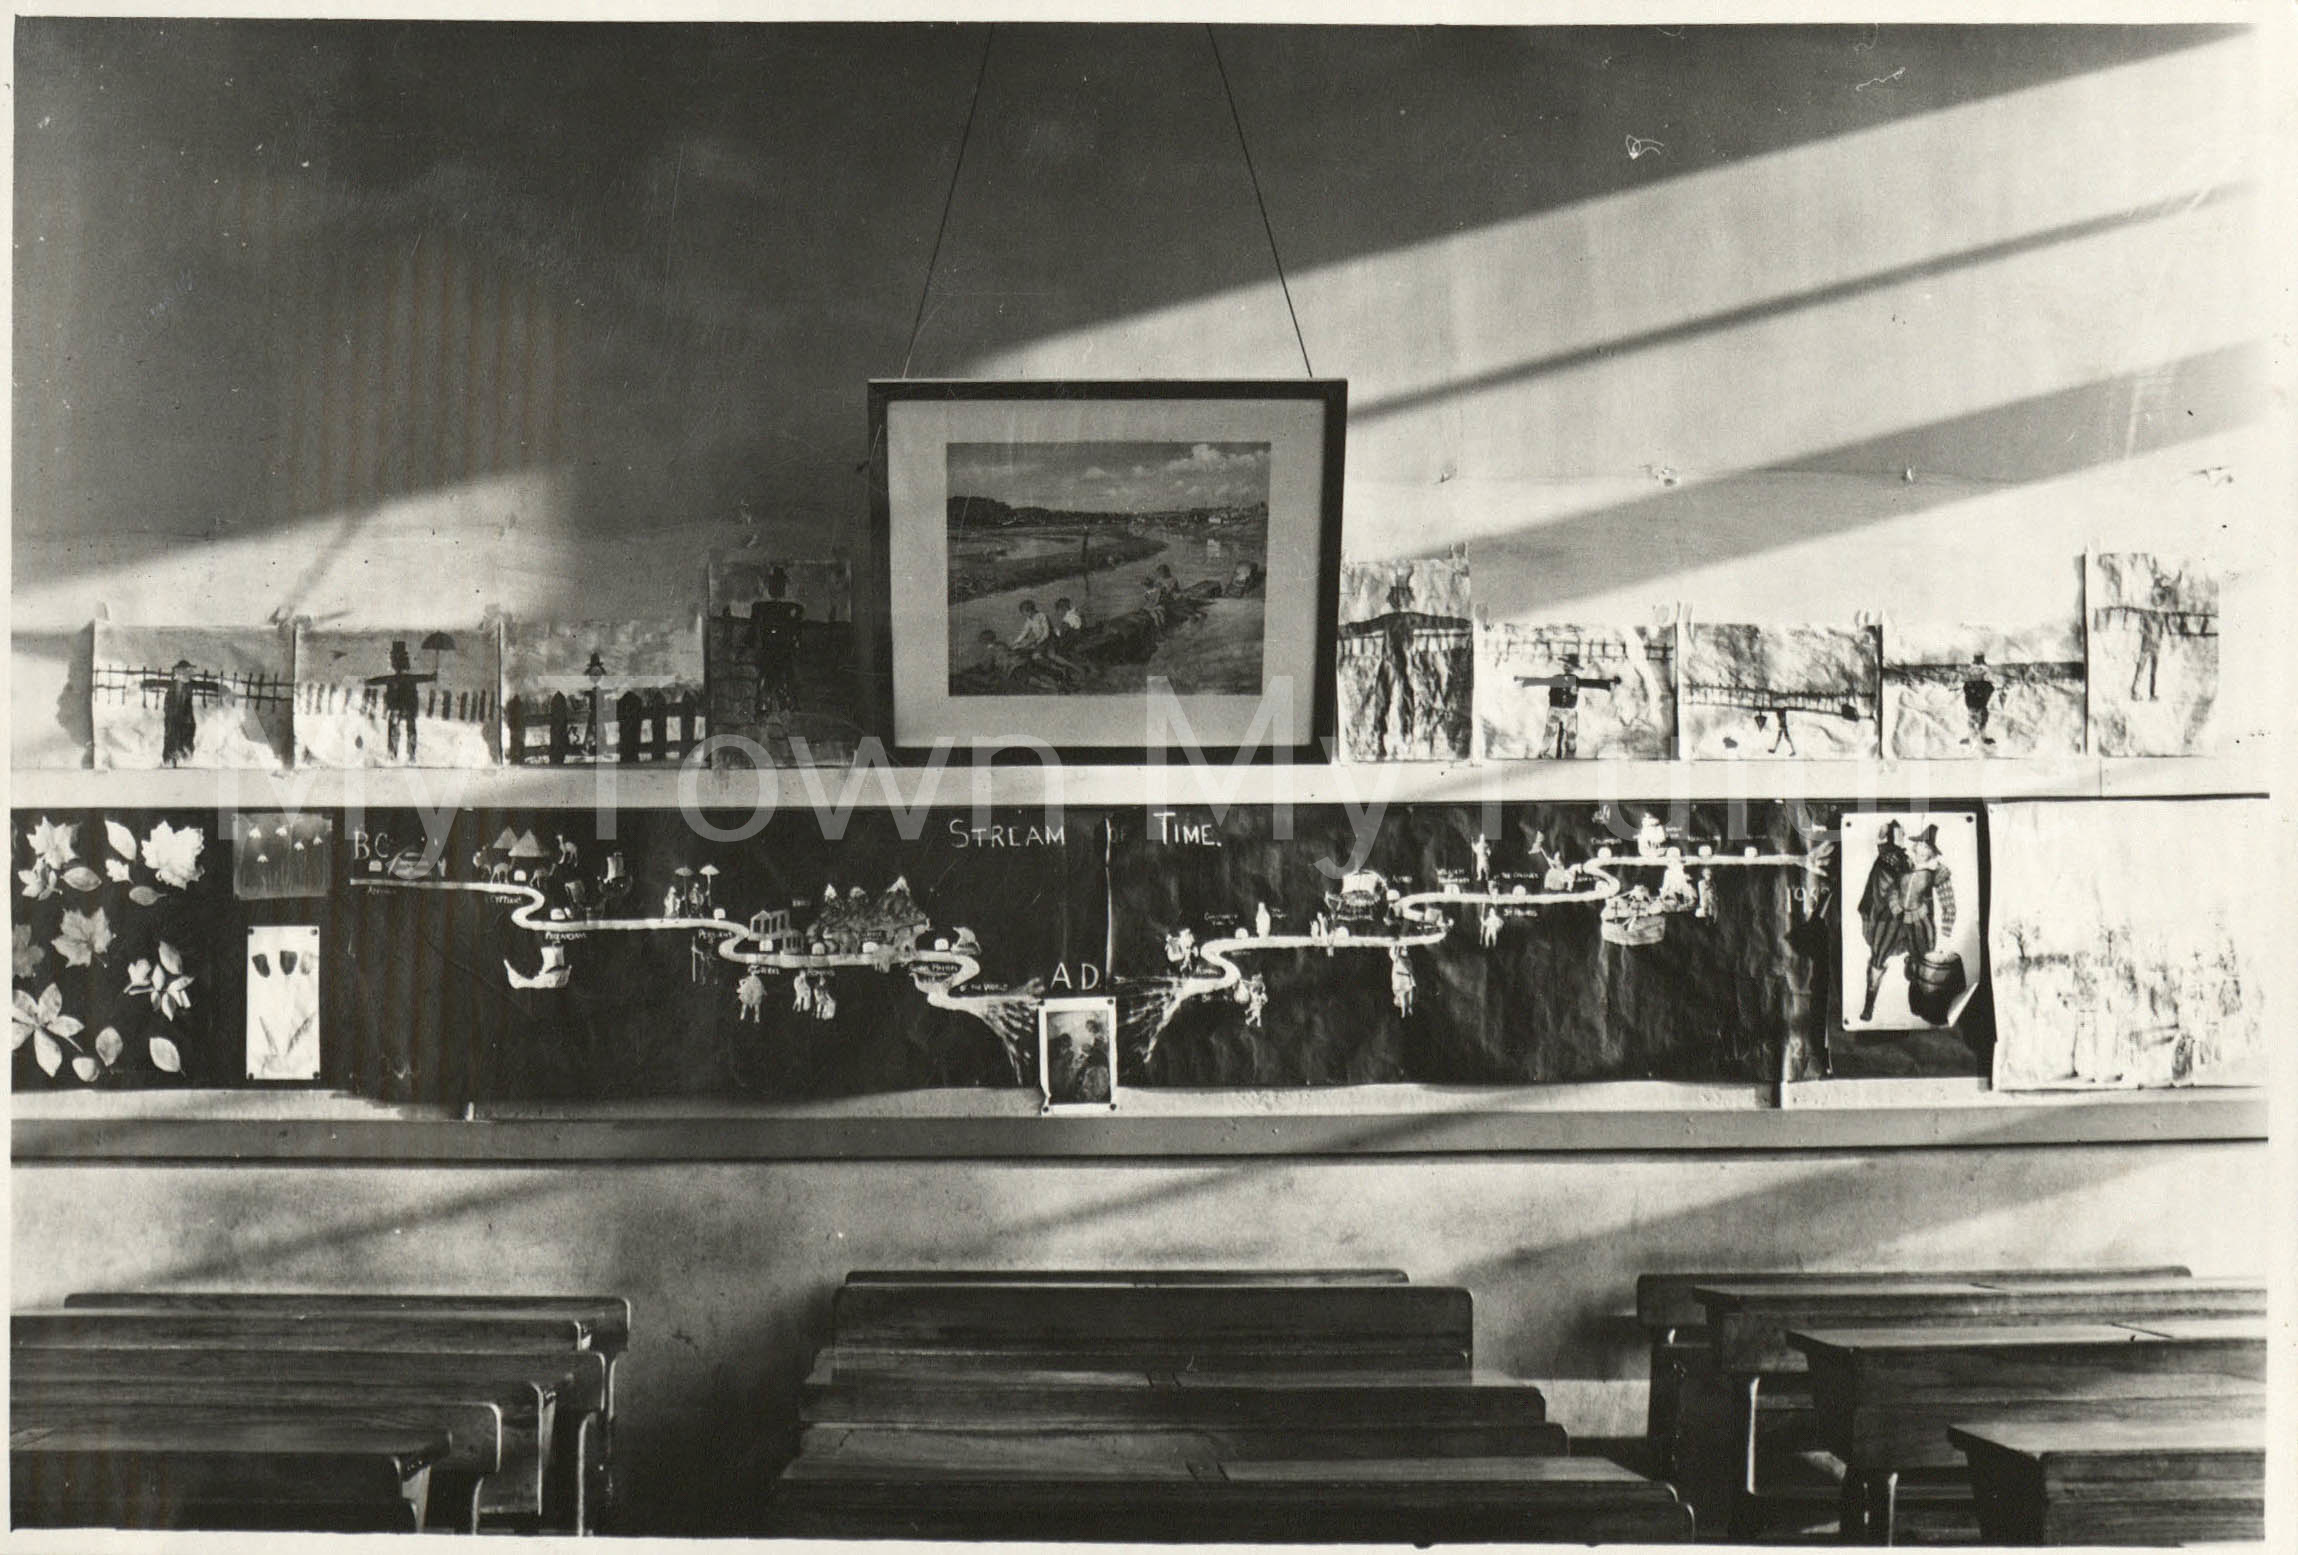 Fleetham Steet School,